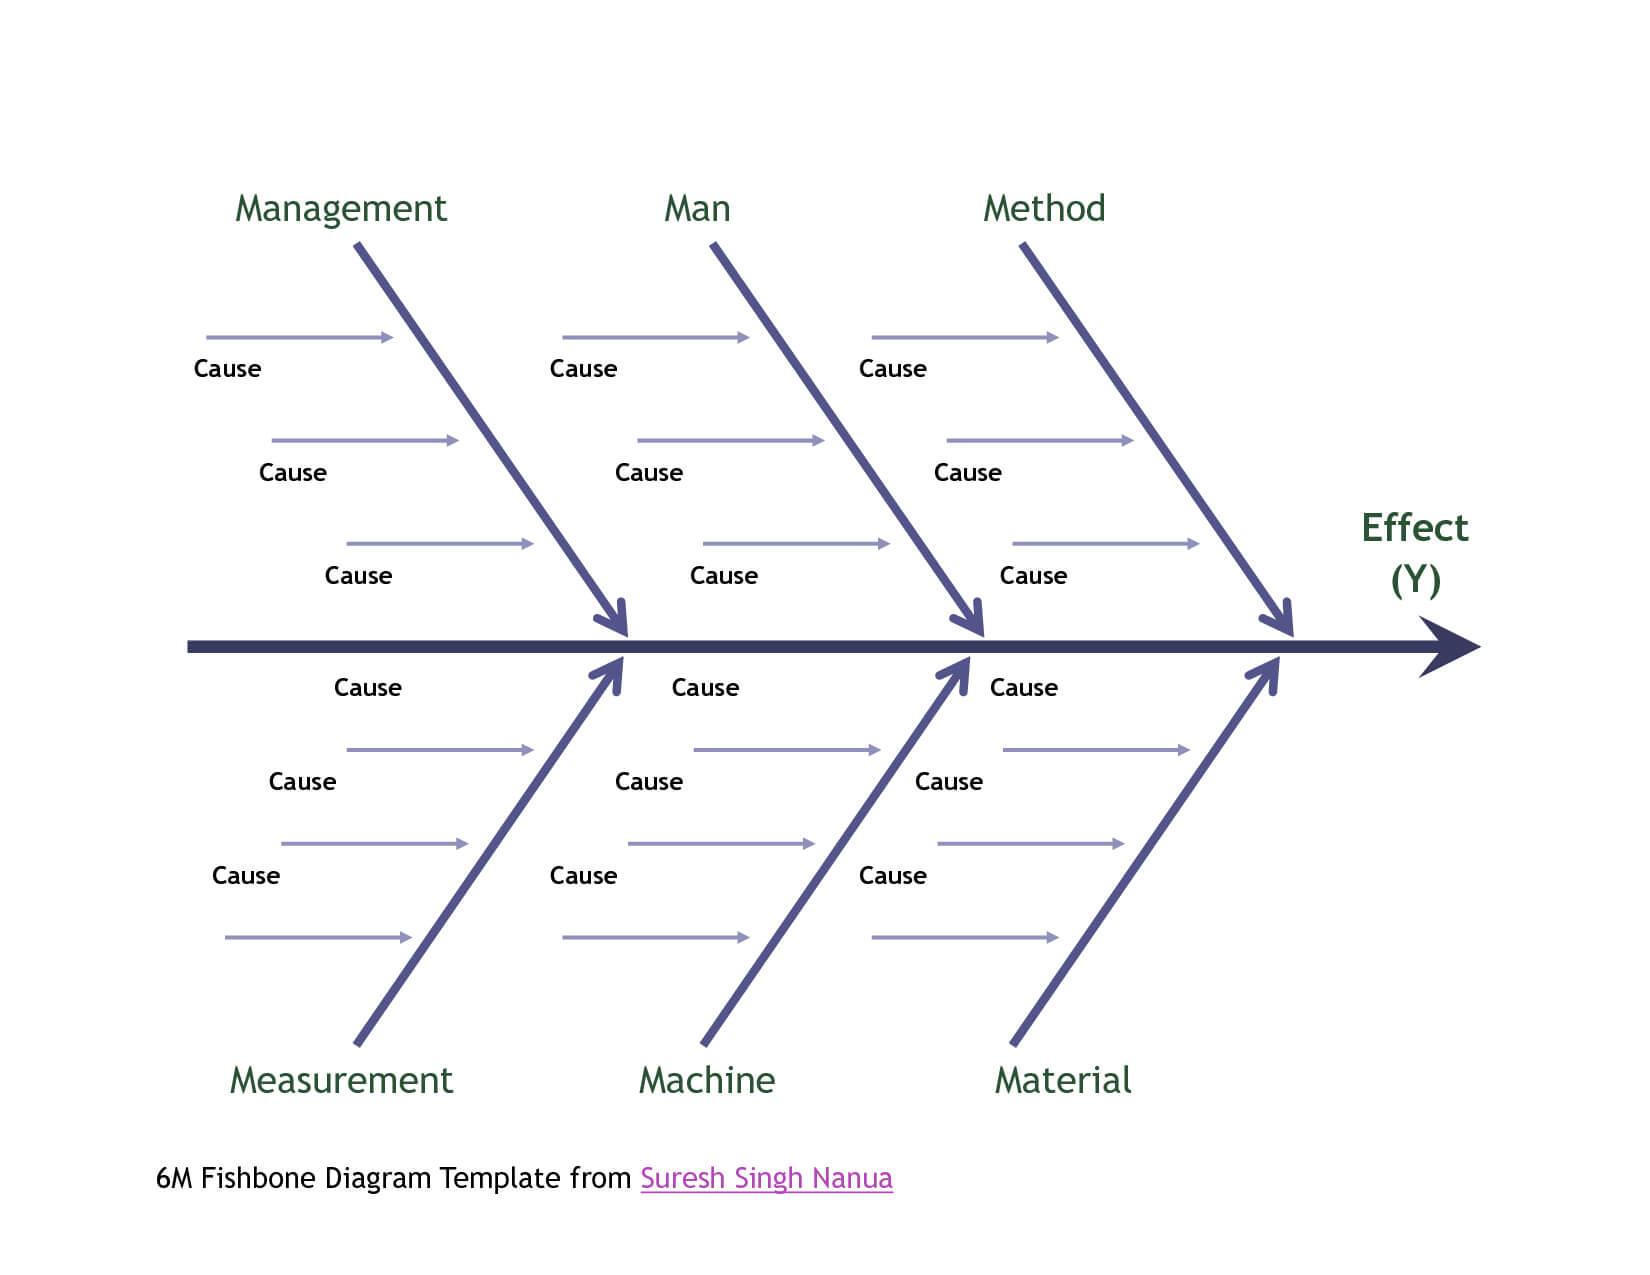 044 Template Ideas Fishbone Diagram Ipbxi231 Unforgettable Within Blank Fishbone Diagram Template Word